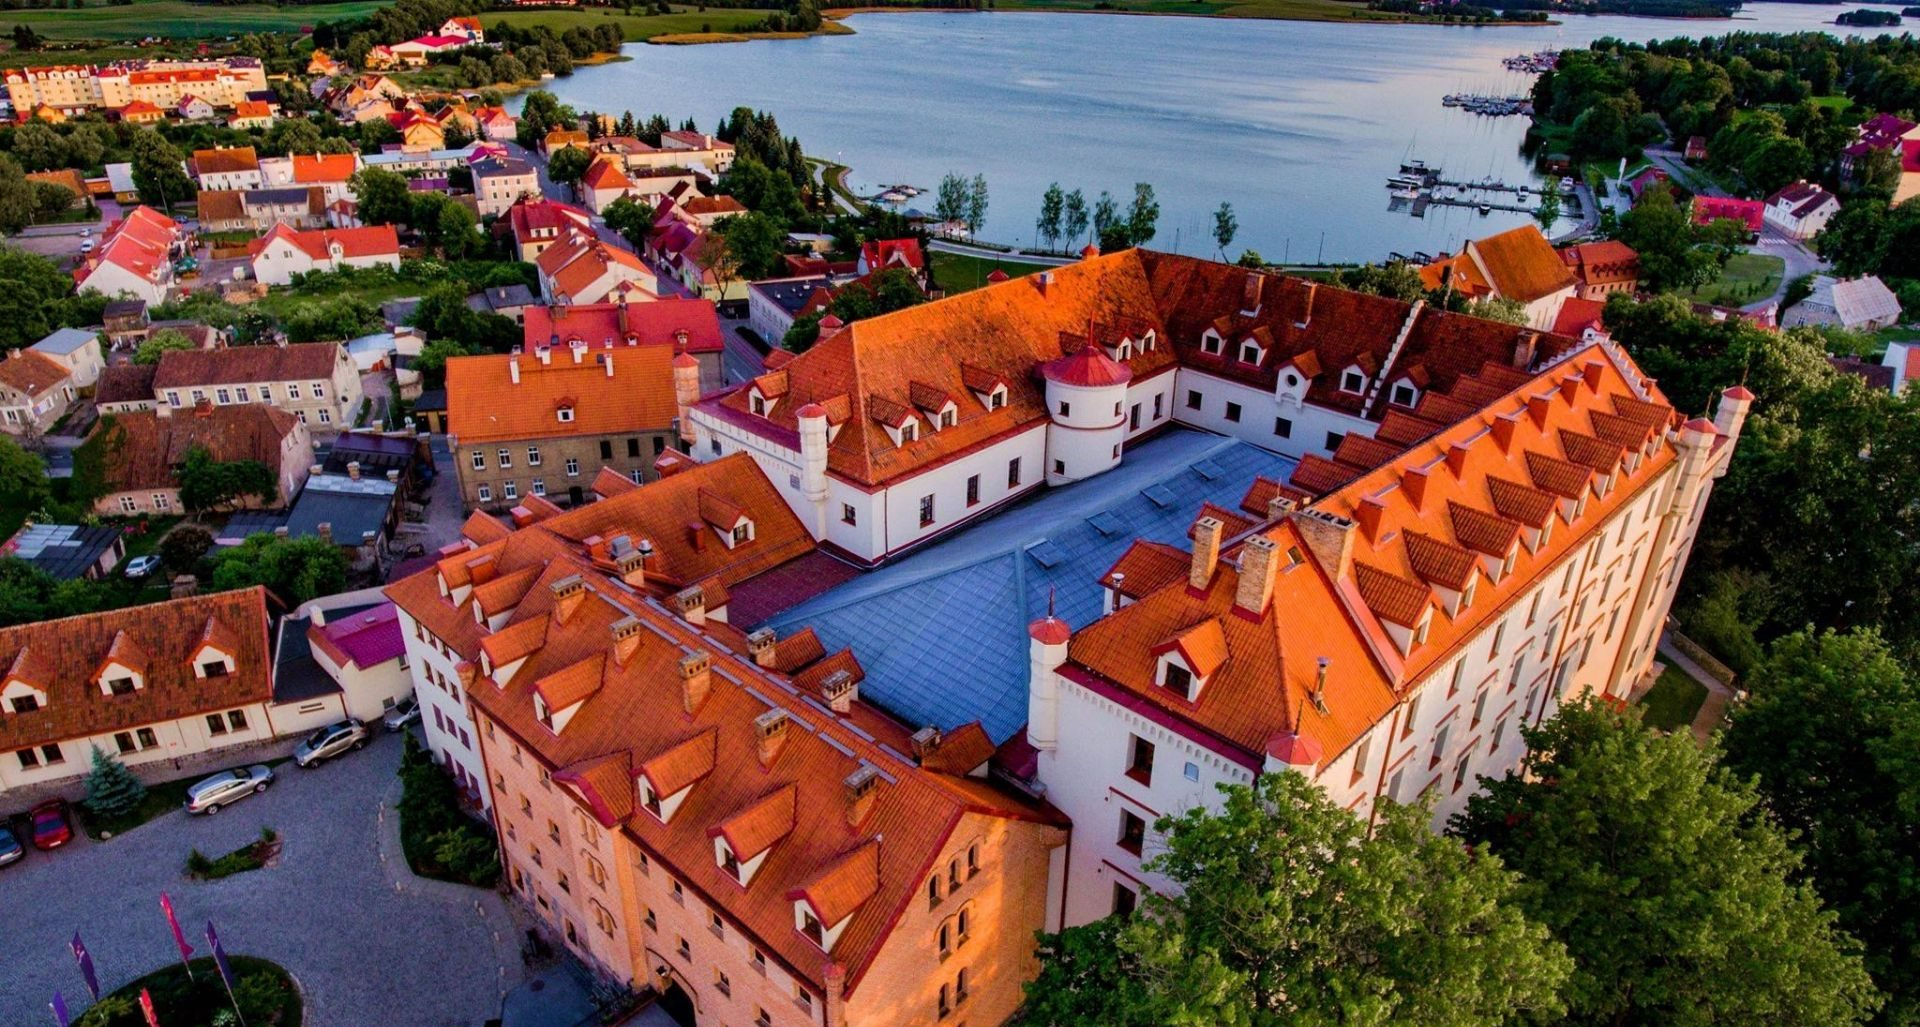 zamek ryn hotel